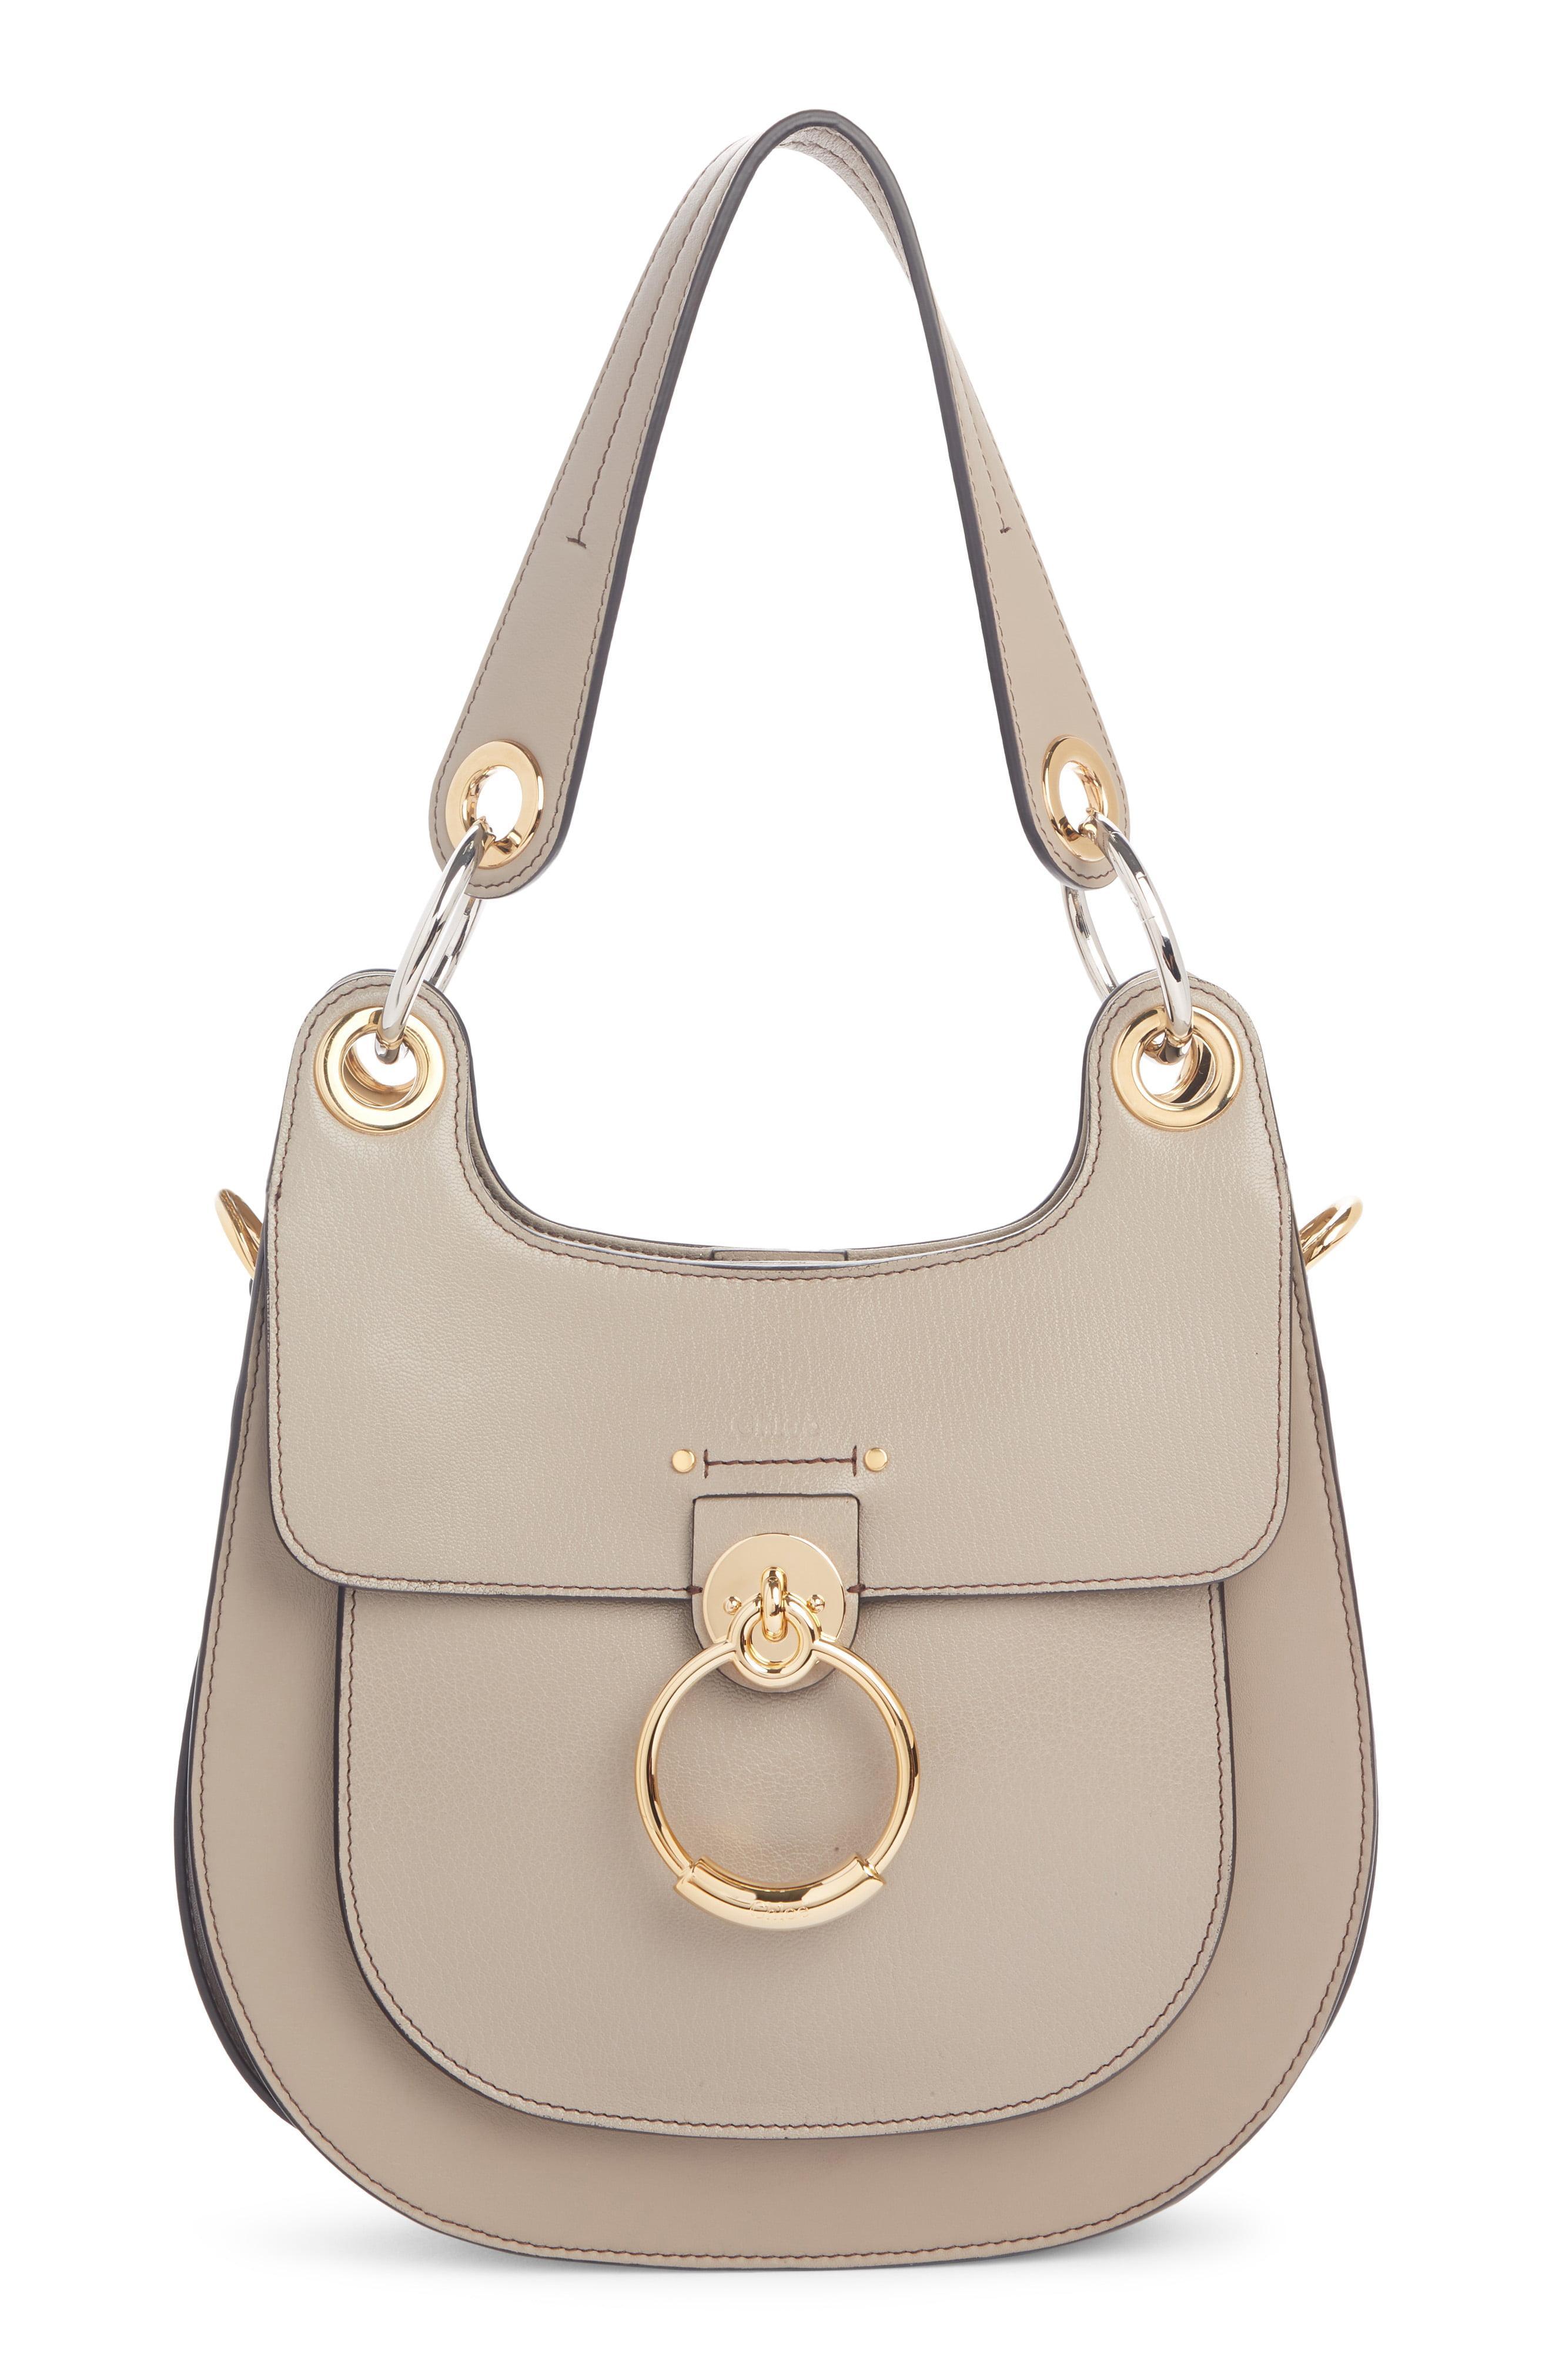 920020972d94 Lyst - Chloé Chloé Medium Tess Calfskin Leather Hobo Bag in Gray